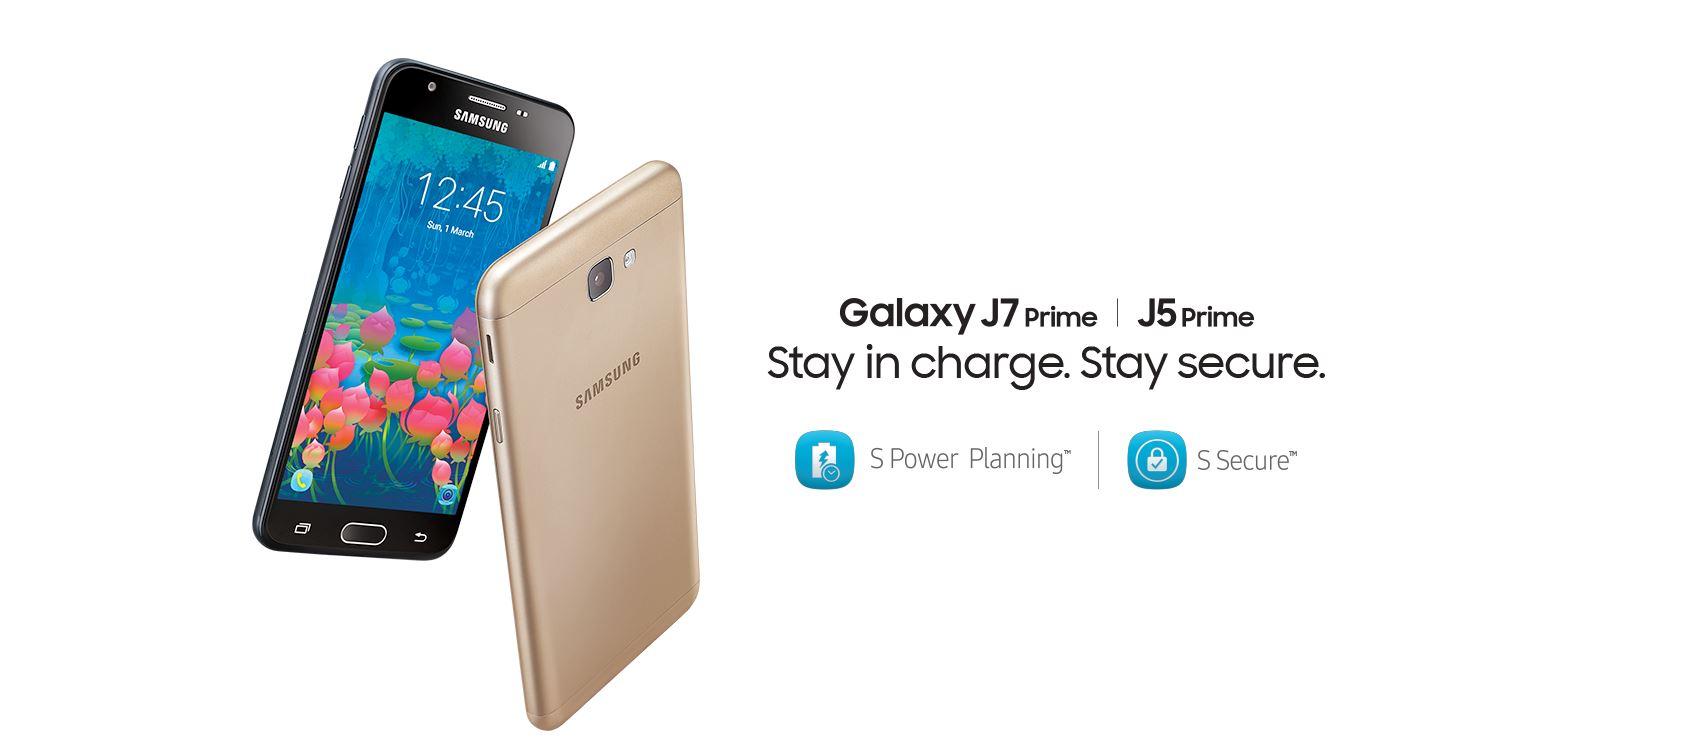 Samsung Galaxy J5 Prime And Galaxy J7 Prime Price In Nepal